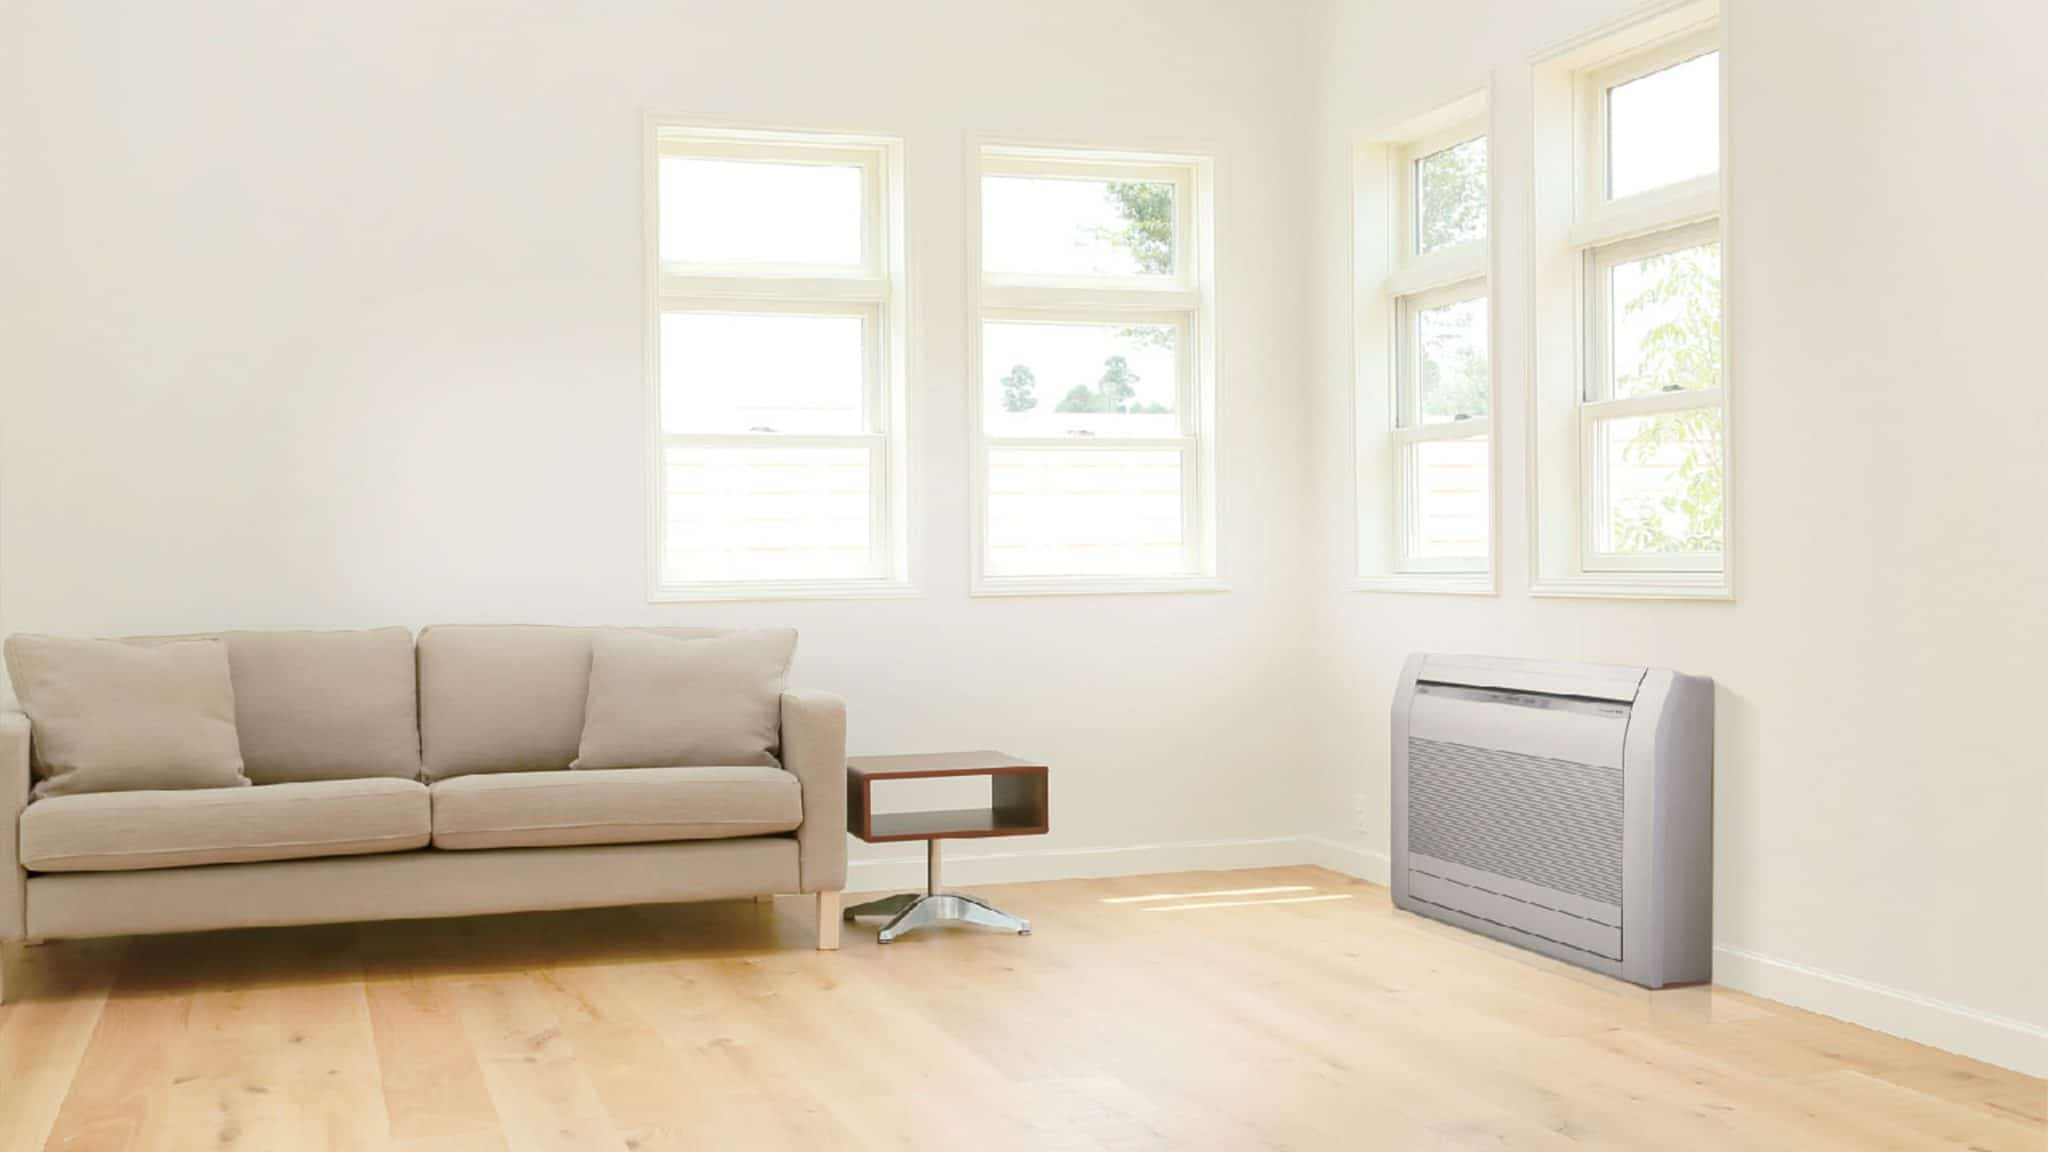 Green House Solutions zonnepanelen batterijopslag laadpalen airconditioning fujitsu 000001